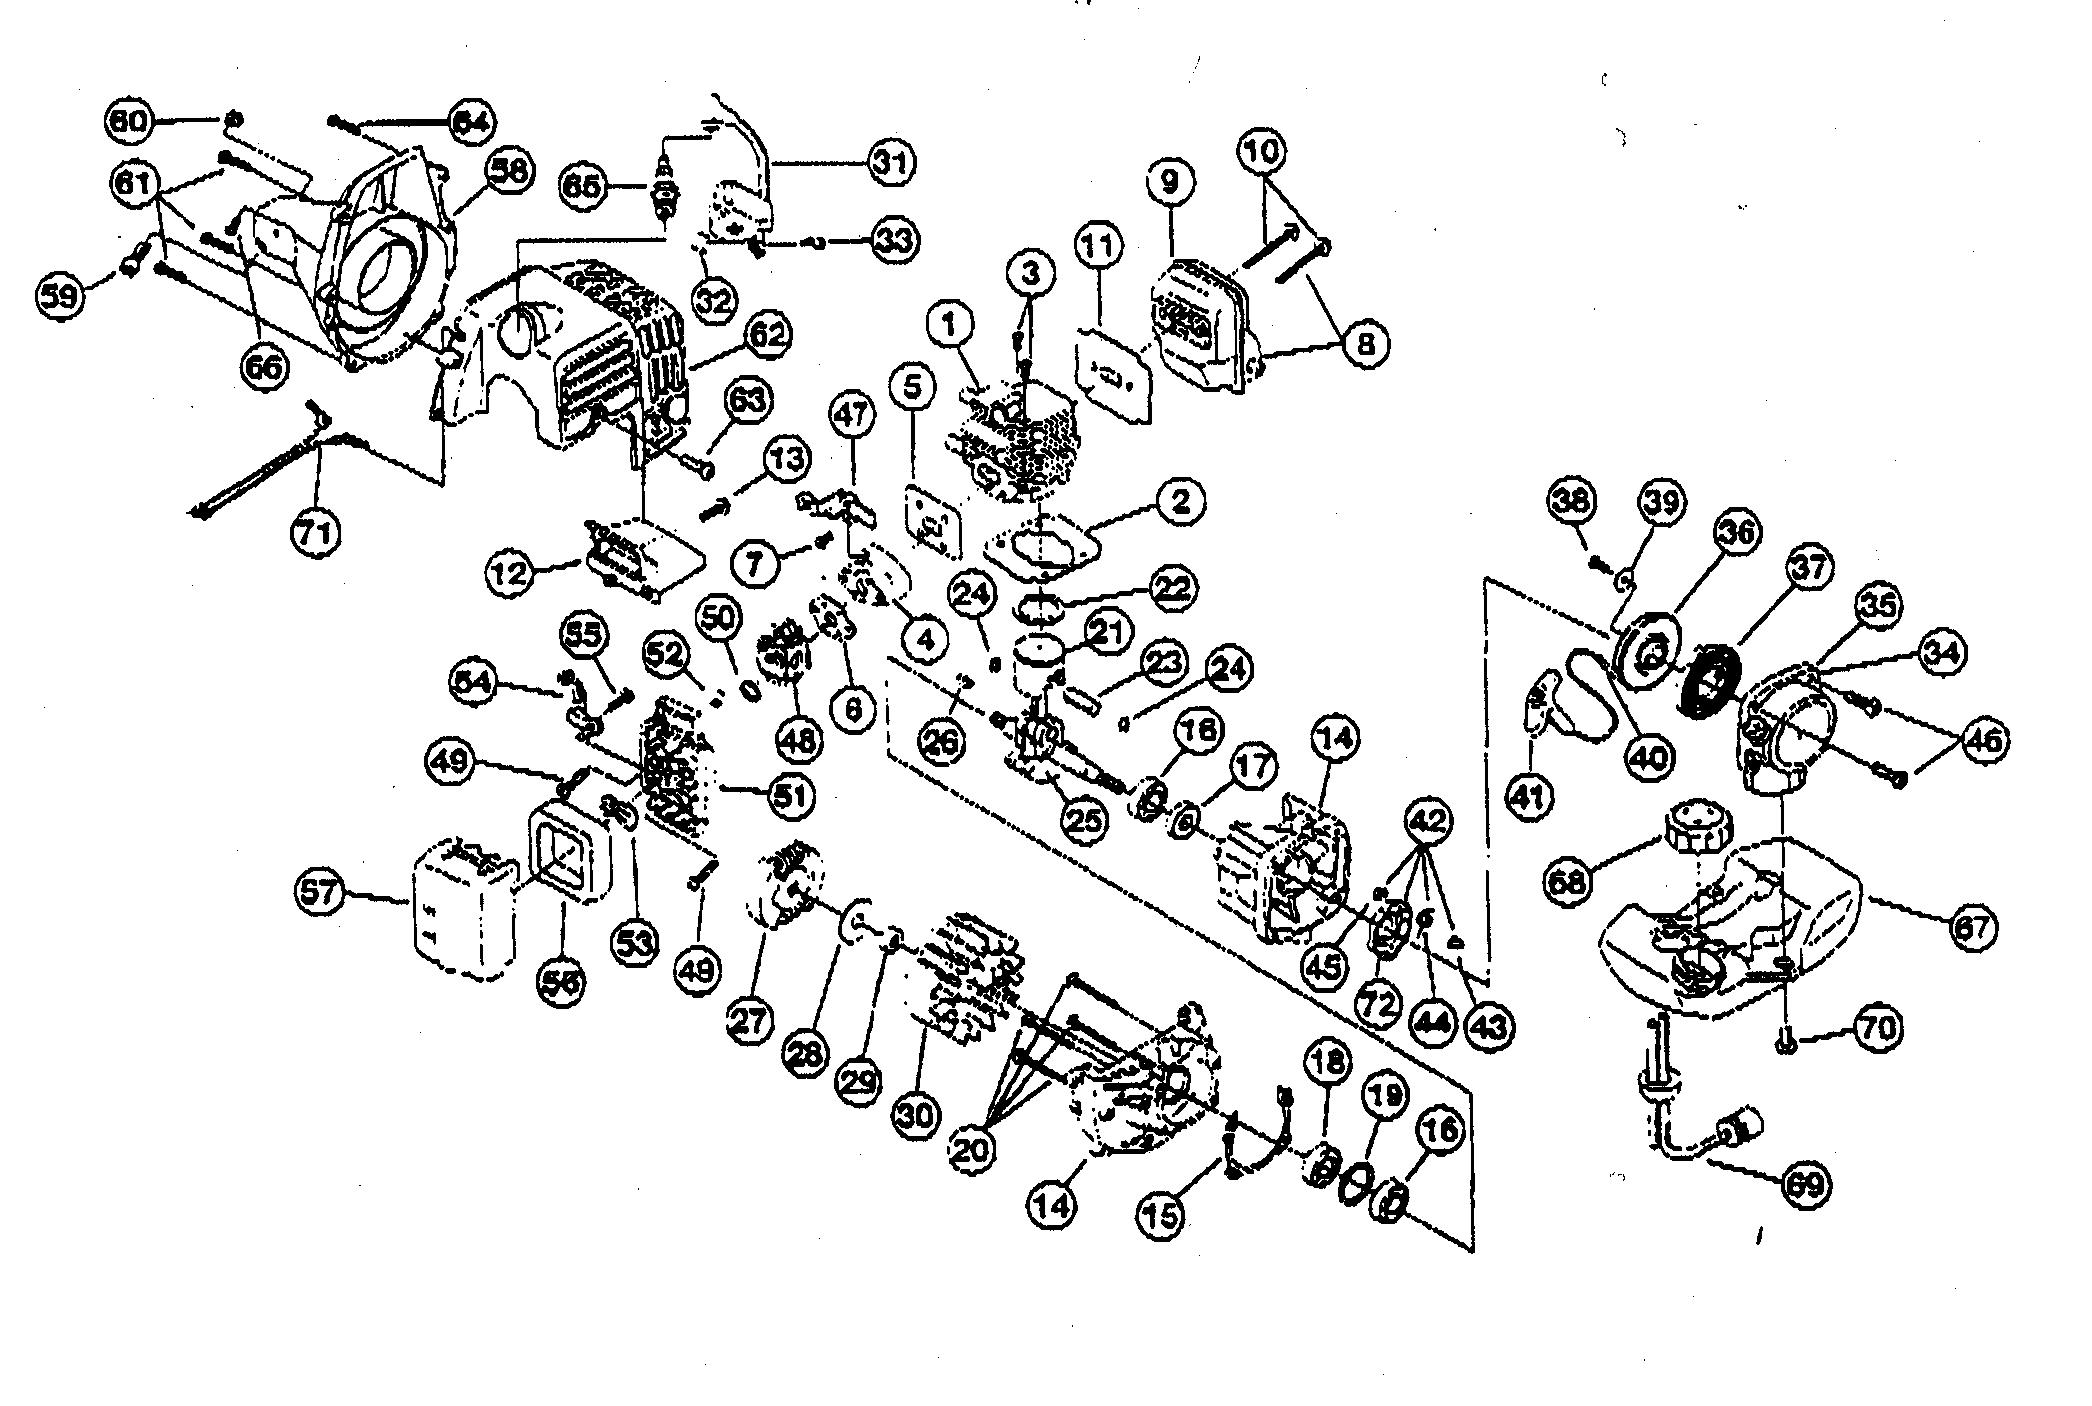 perodua viva wiring diagram pdf